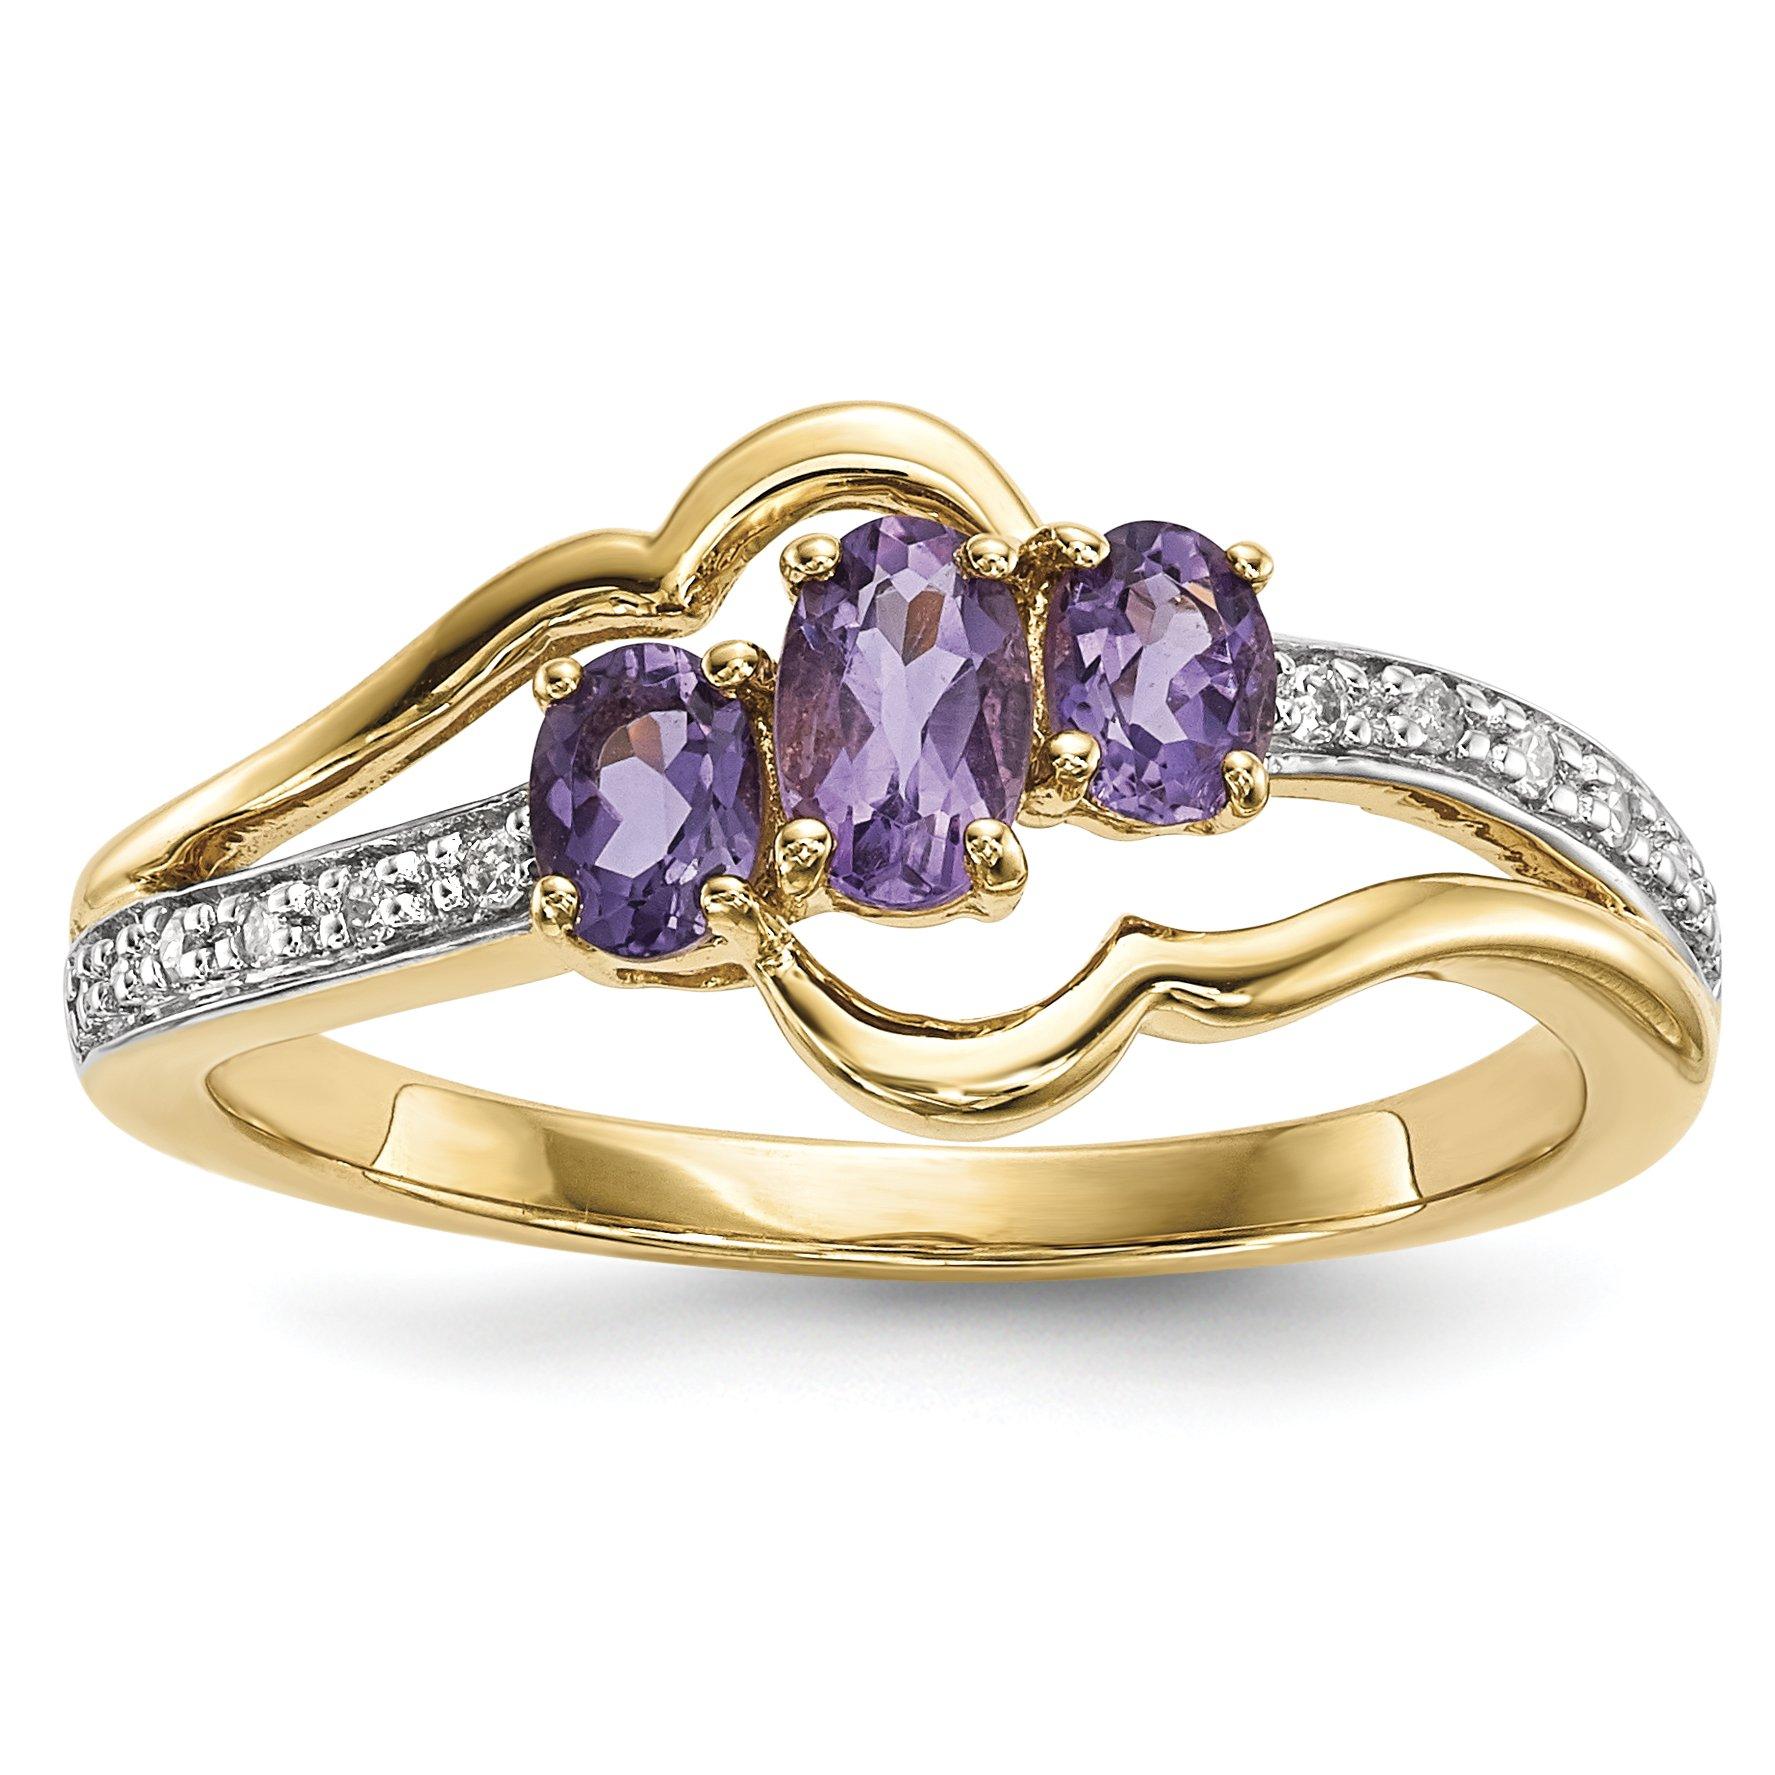 ICE CARATS 14k Yellow Gold Purple Amethyst Diamond Band Ring Size 7.00 Gemstone Fine Jewelry Gift Set For Women Heart